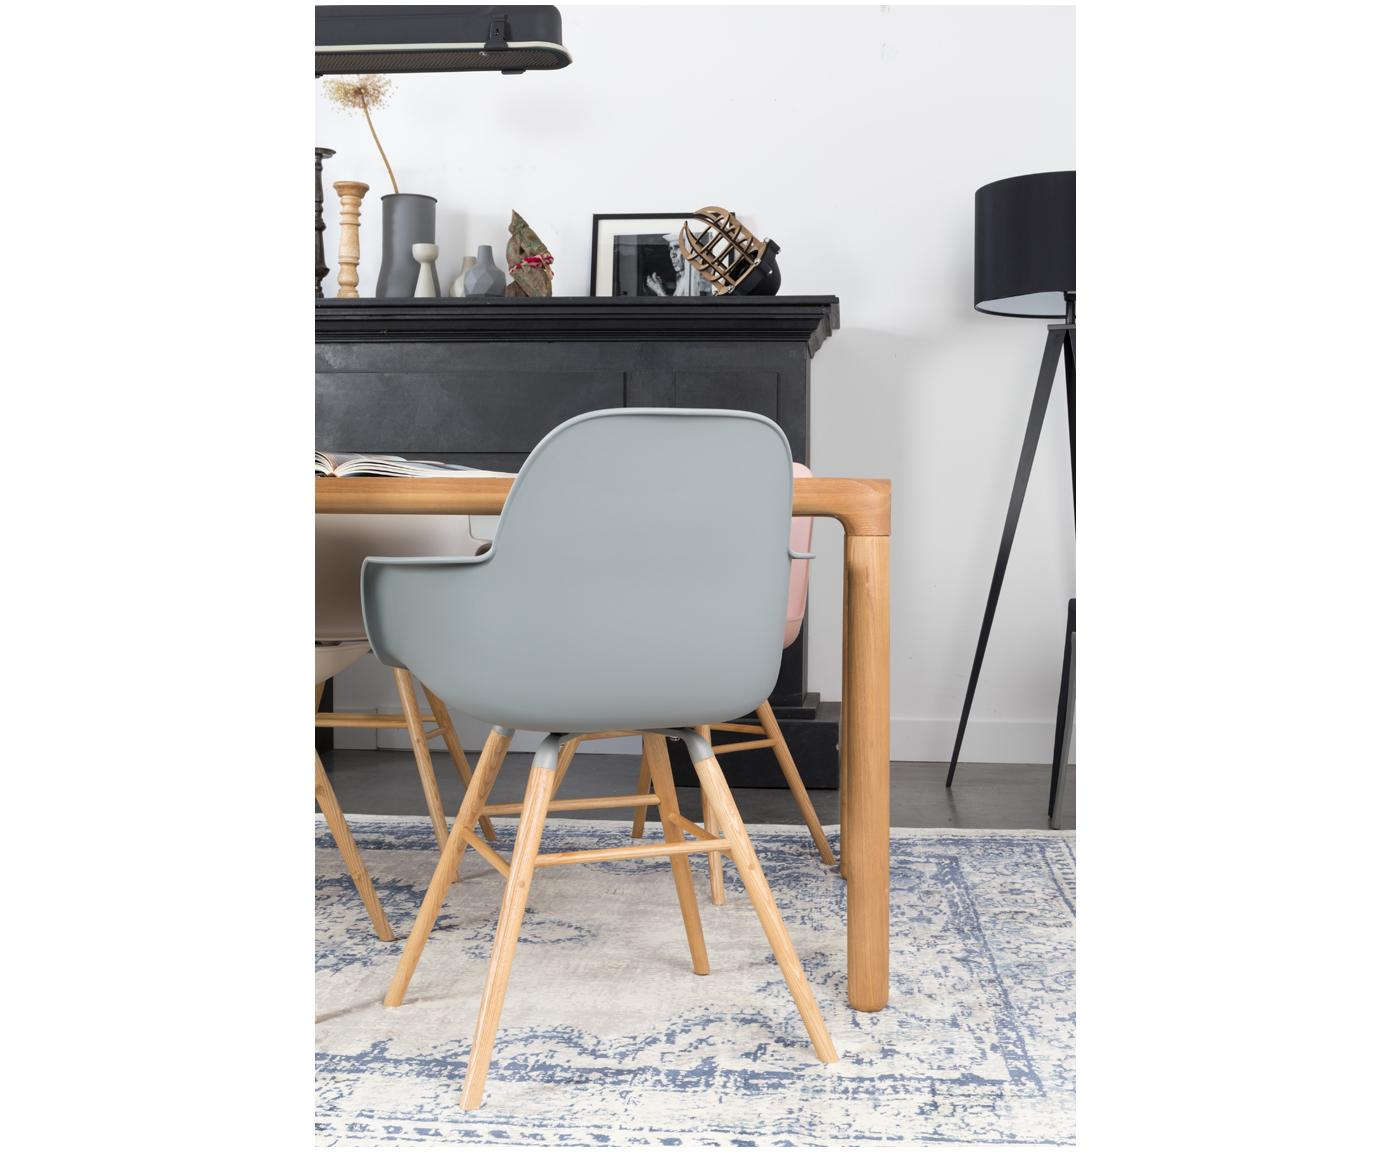 Armlehnstuhl Albert Kuip mit Holzbeinen, Sitzfläche: 100% Polypropylen, Füße: Eschenholz, Grau, B 59 x T 55 cm